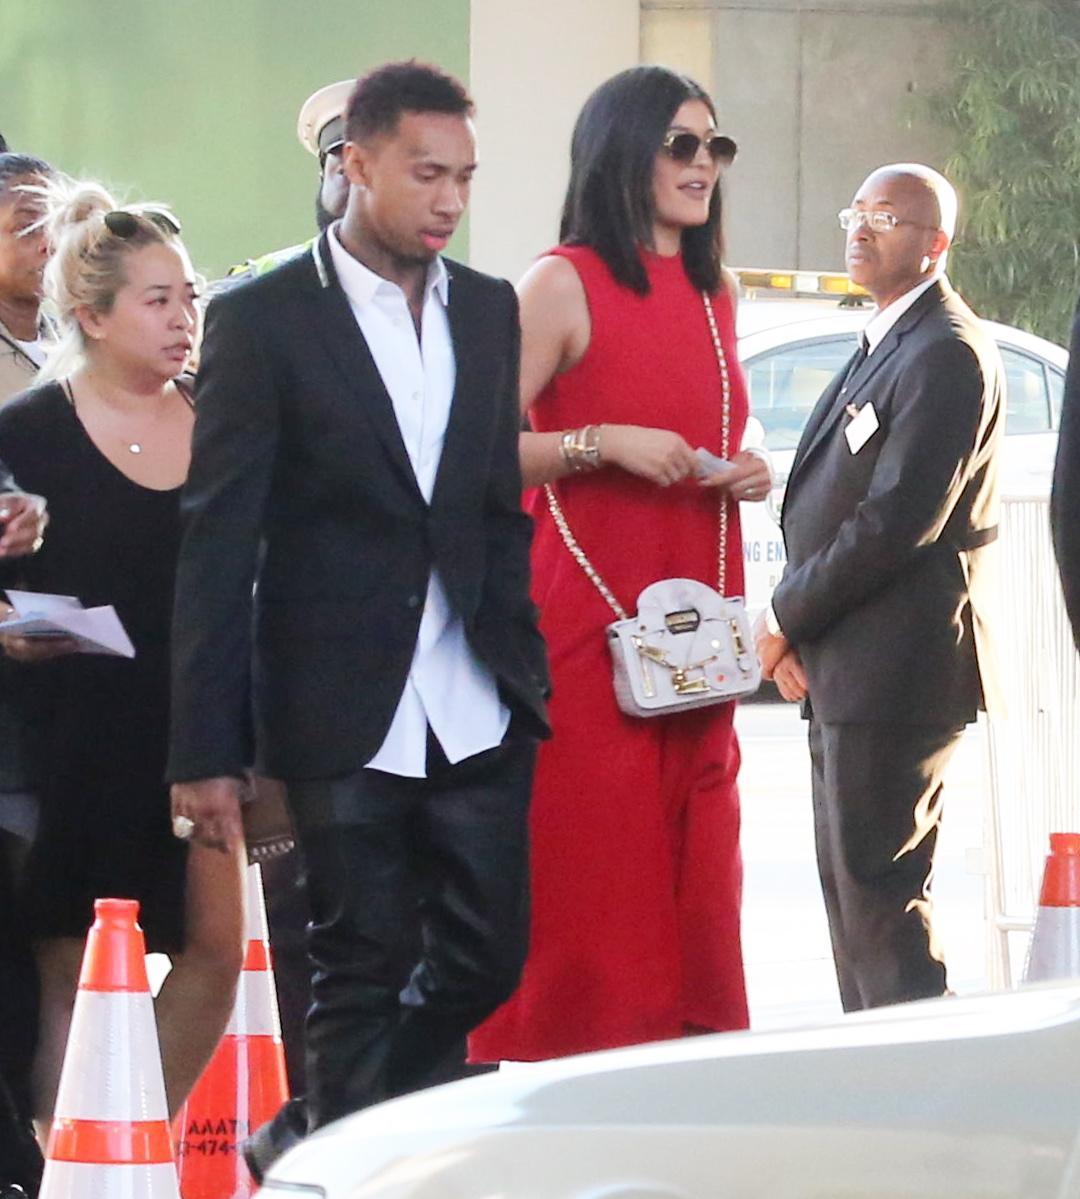 Kylie Jenner insieme al fidanzato Tyga FOTO